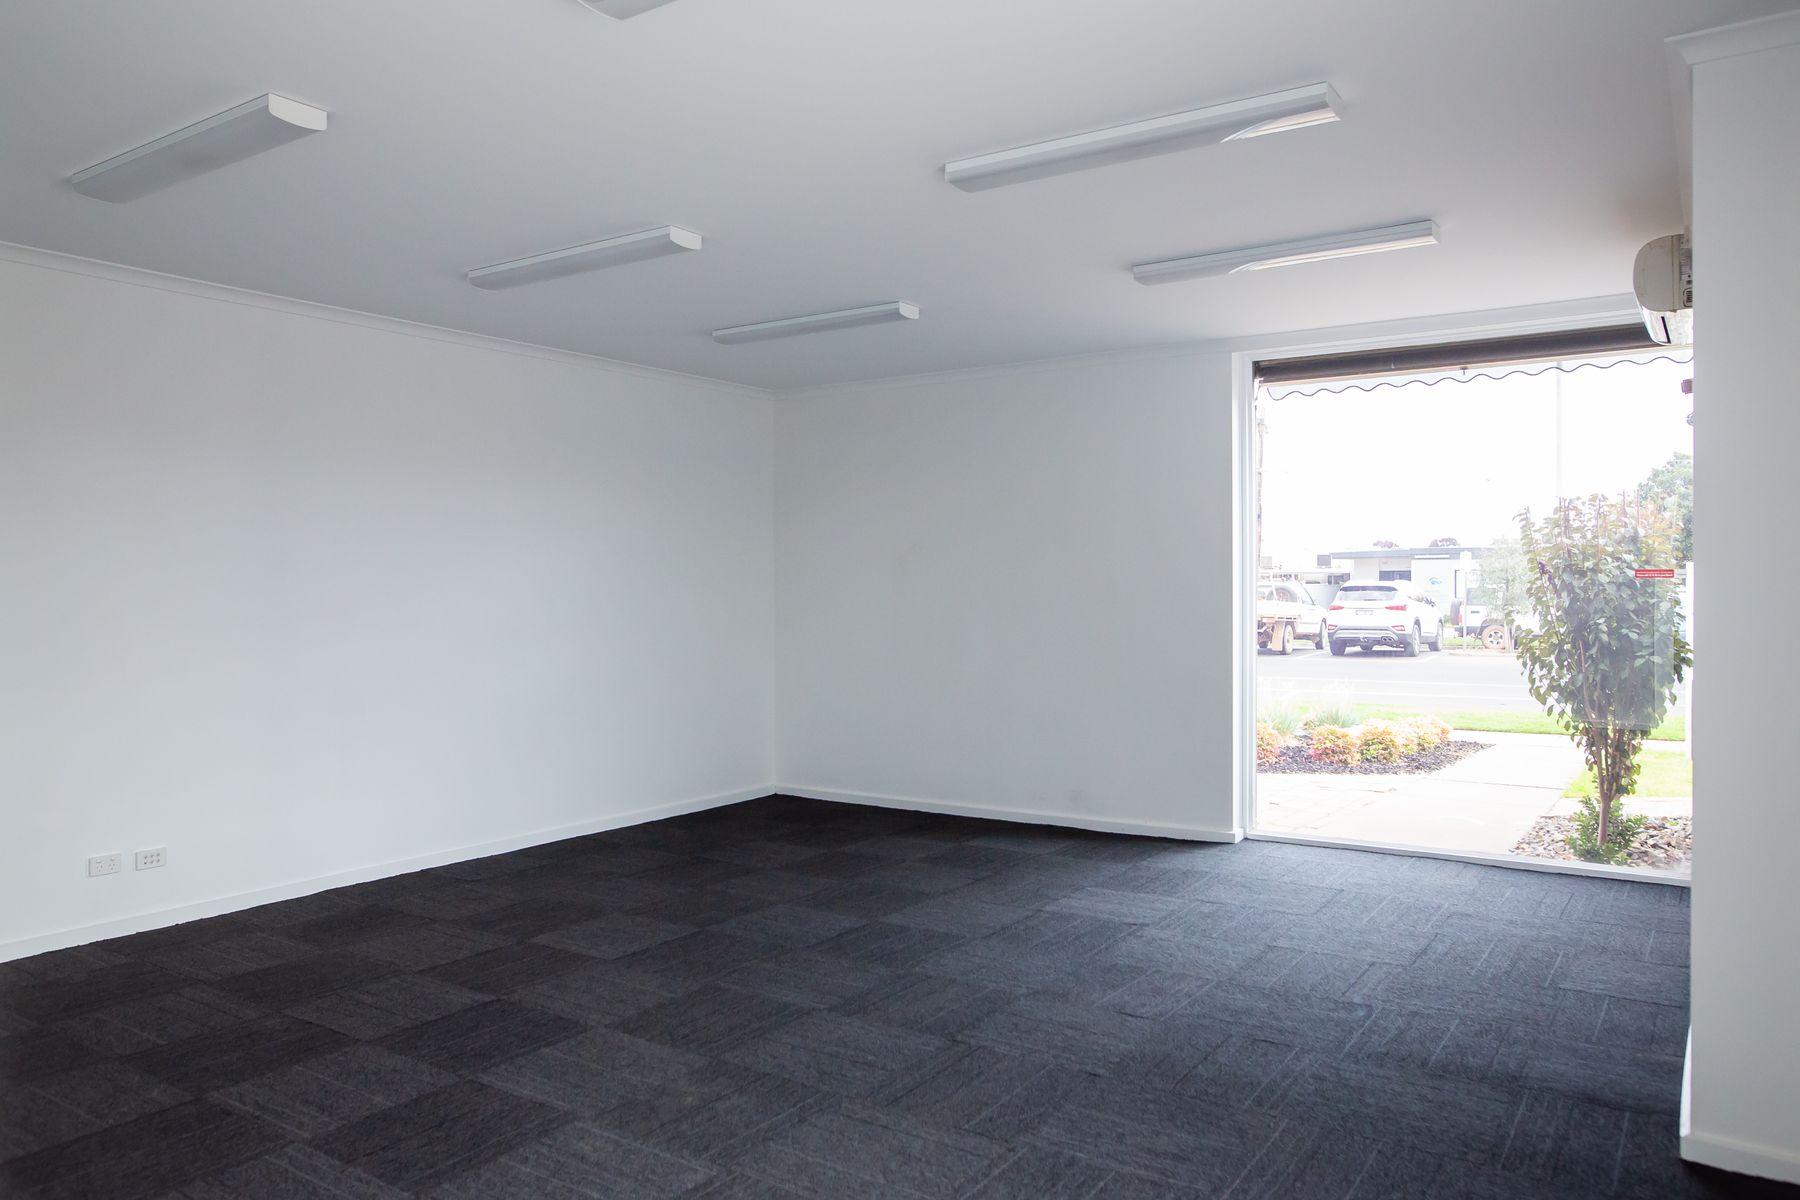 142-144 Langtree Avenue, Mildura, VIC 3500